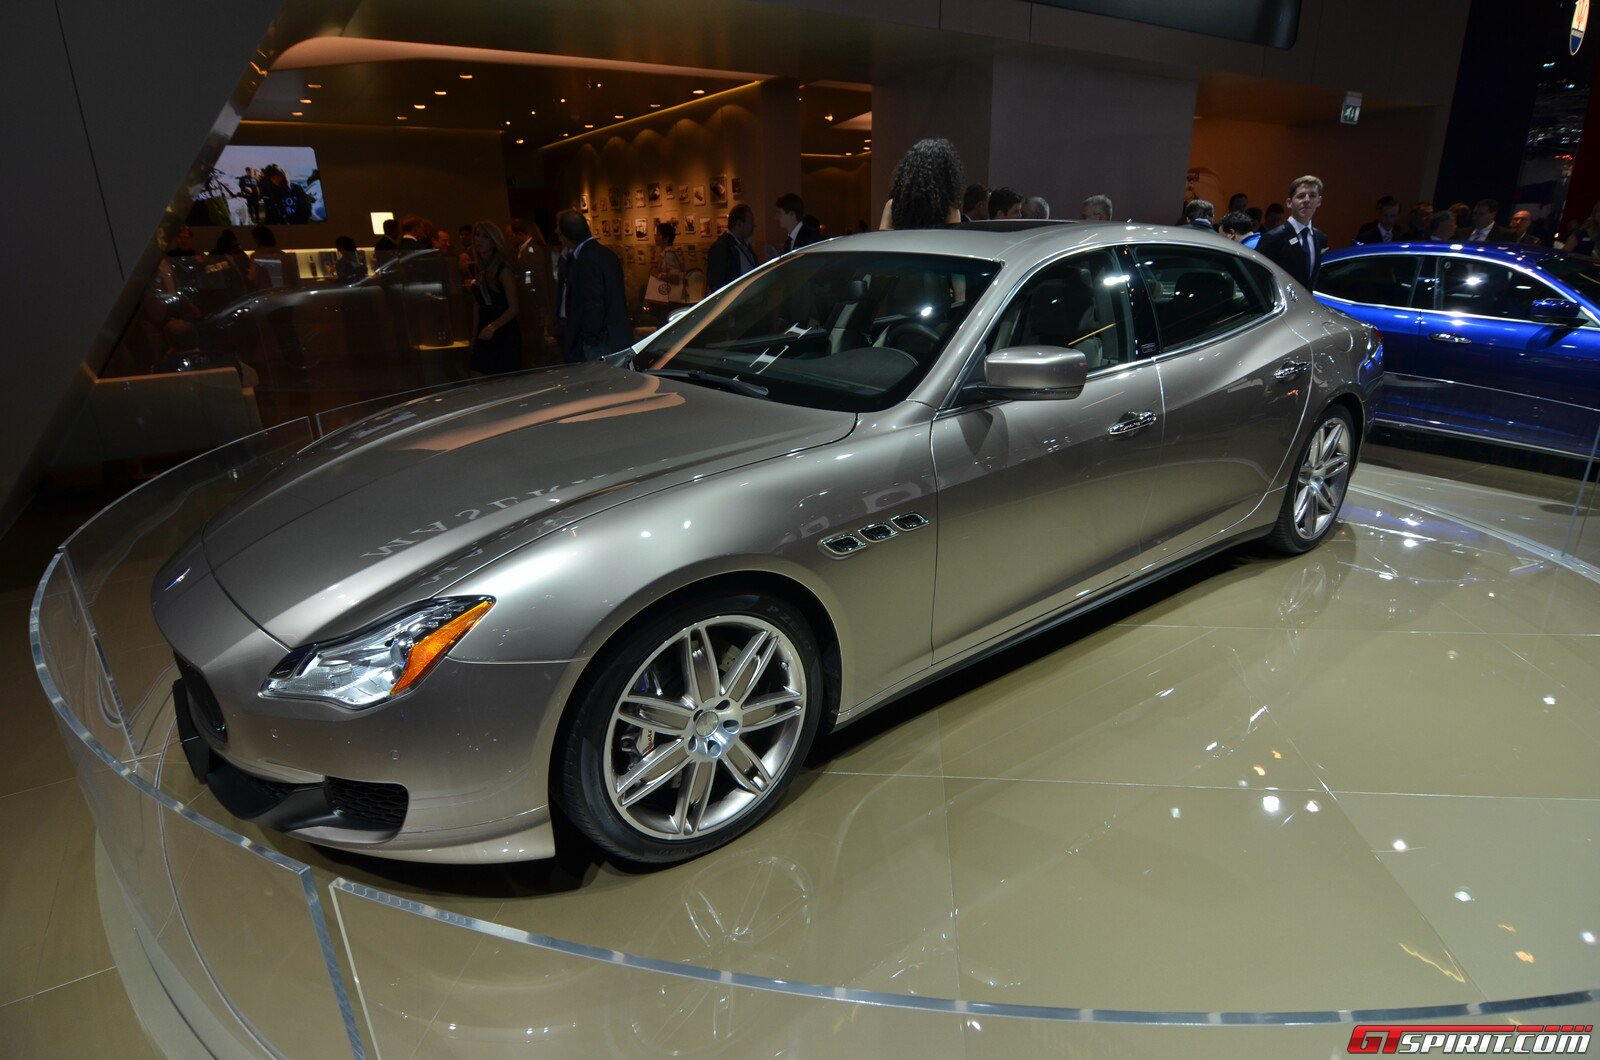 https://storage.googleapis.com/gtspirit/uploads/2013/09/Maserati-Quattroporte-Ermenegildo-Zegna-Limited-Edition-at-Frankfurt.jpg